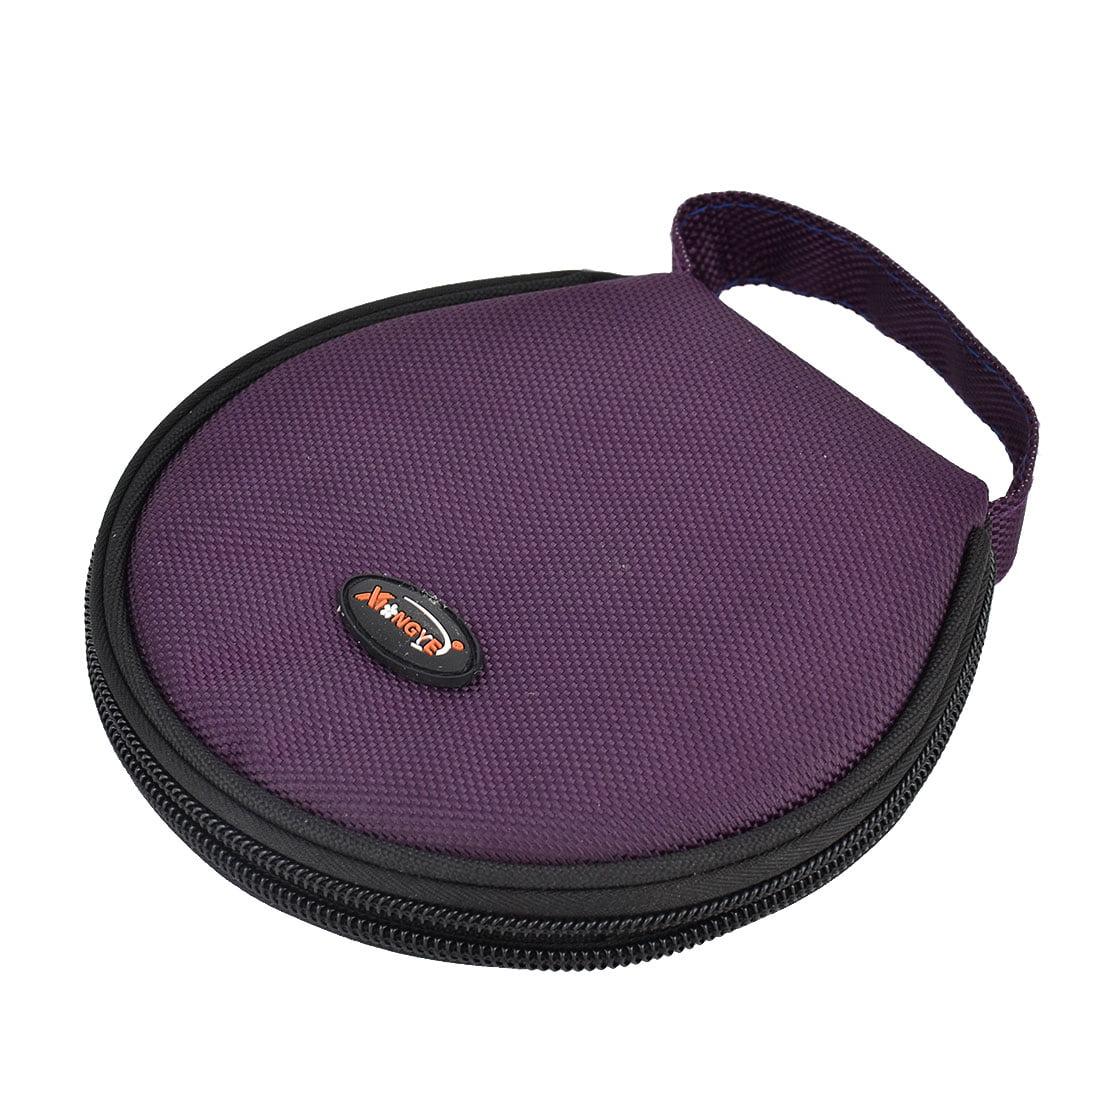 Home Nylon Hand Carry Zipper Round Case Wallet CD Holder Bag Purple 20 Discs